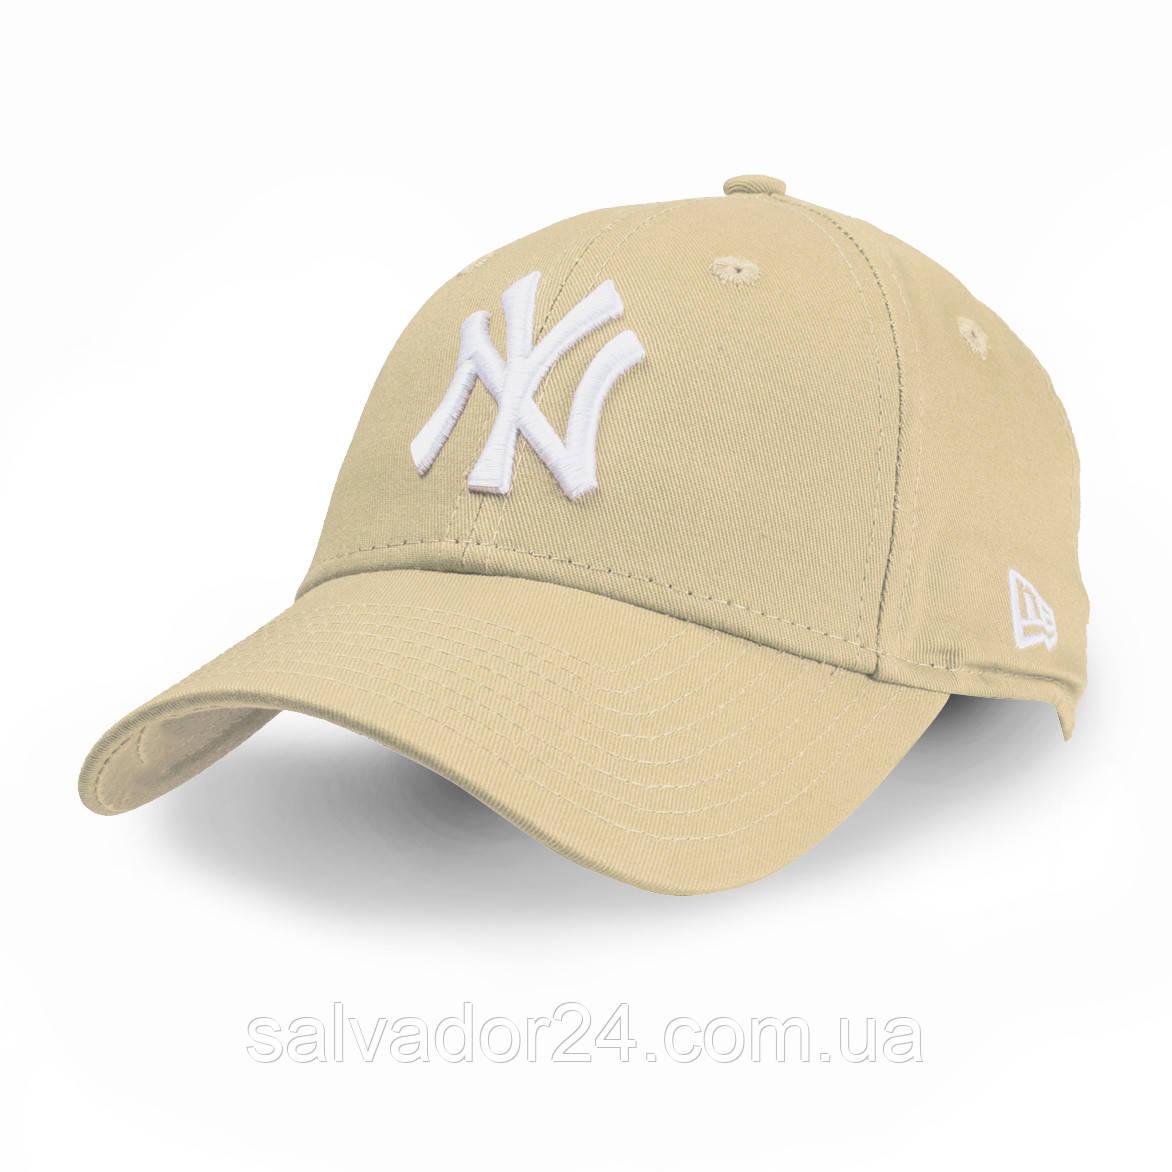 Бейсболка NY бежевая, кепка New York